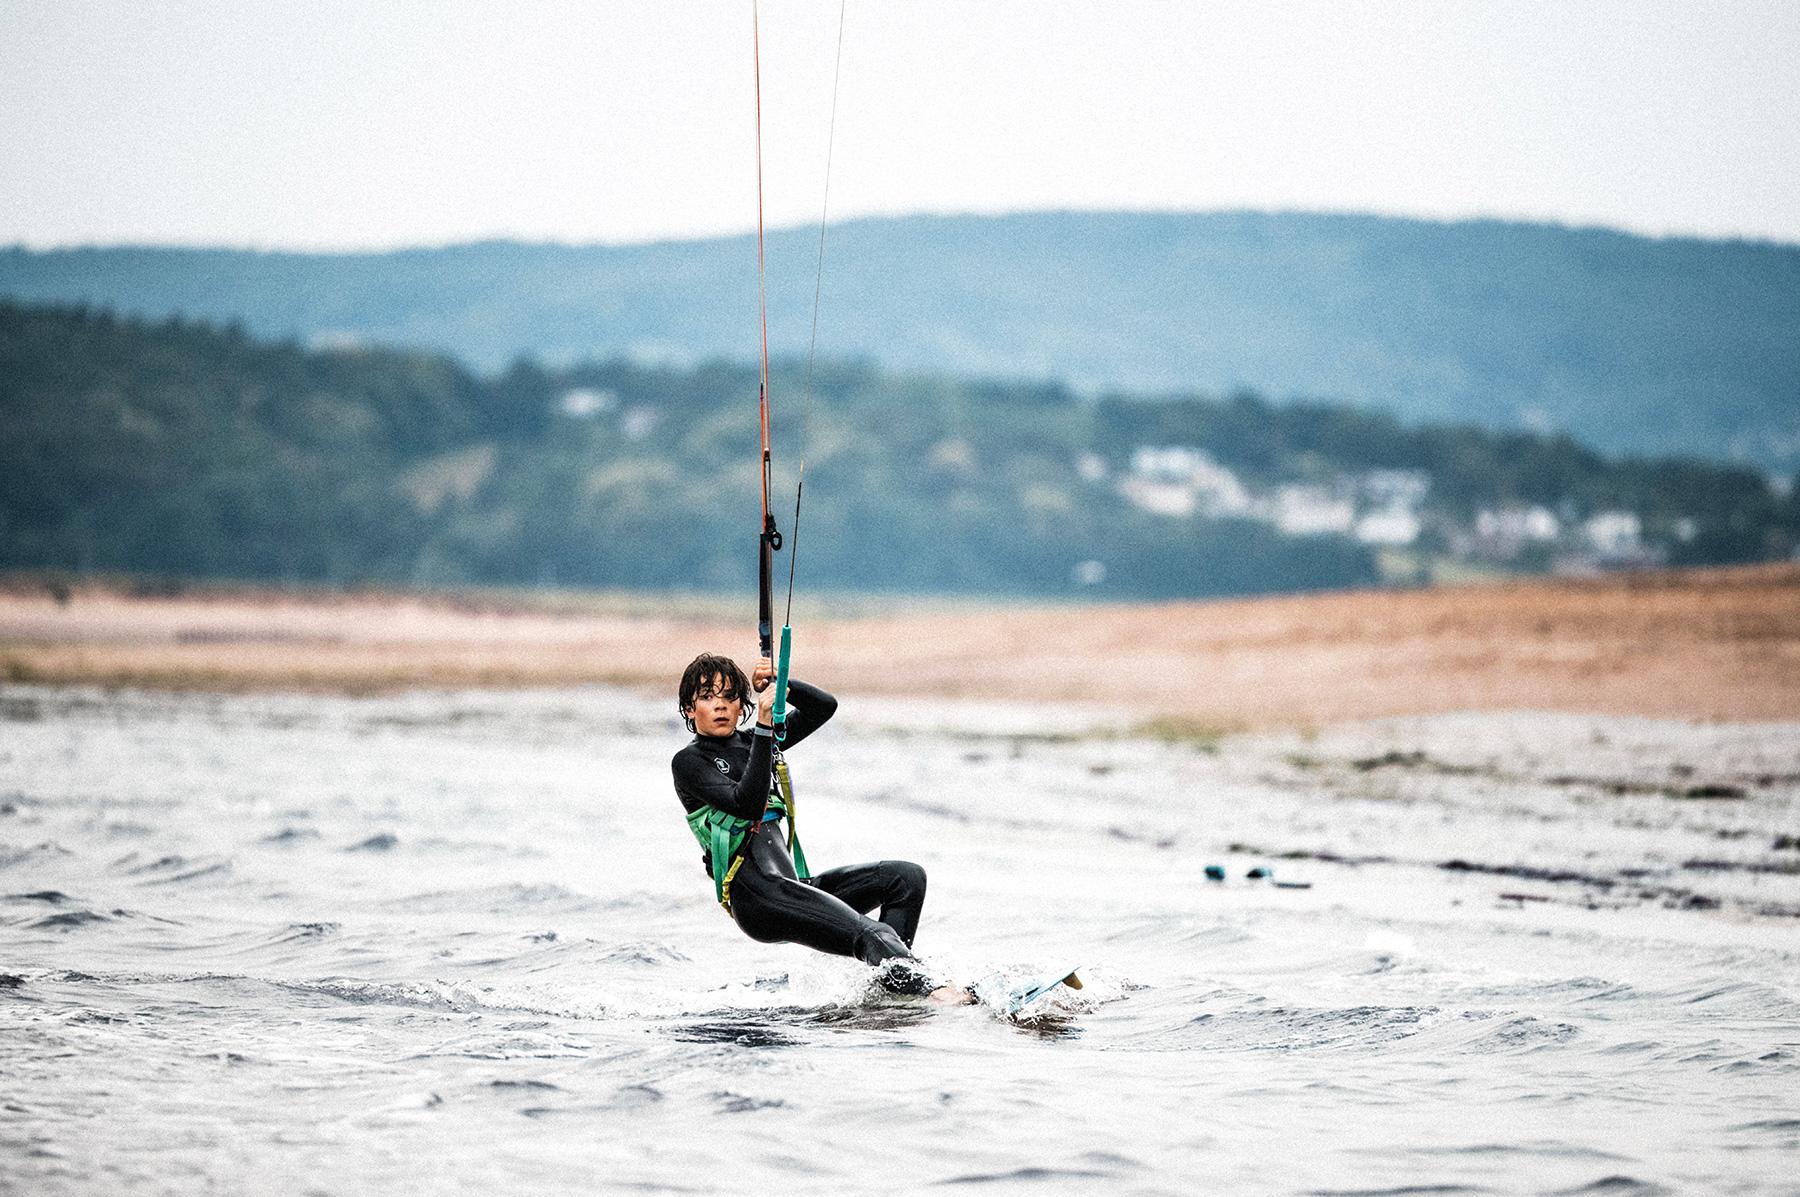 Boy kitesurf